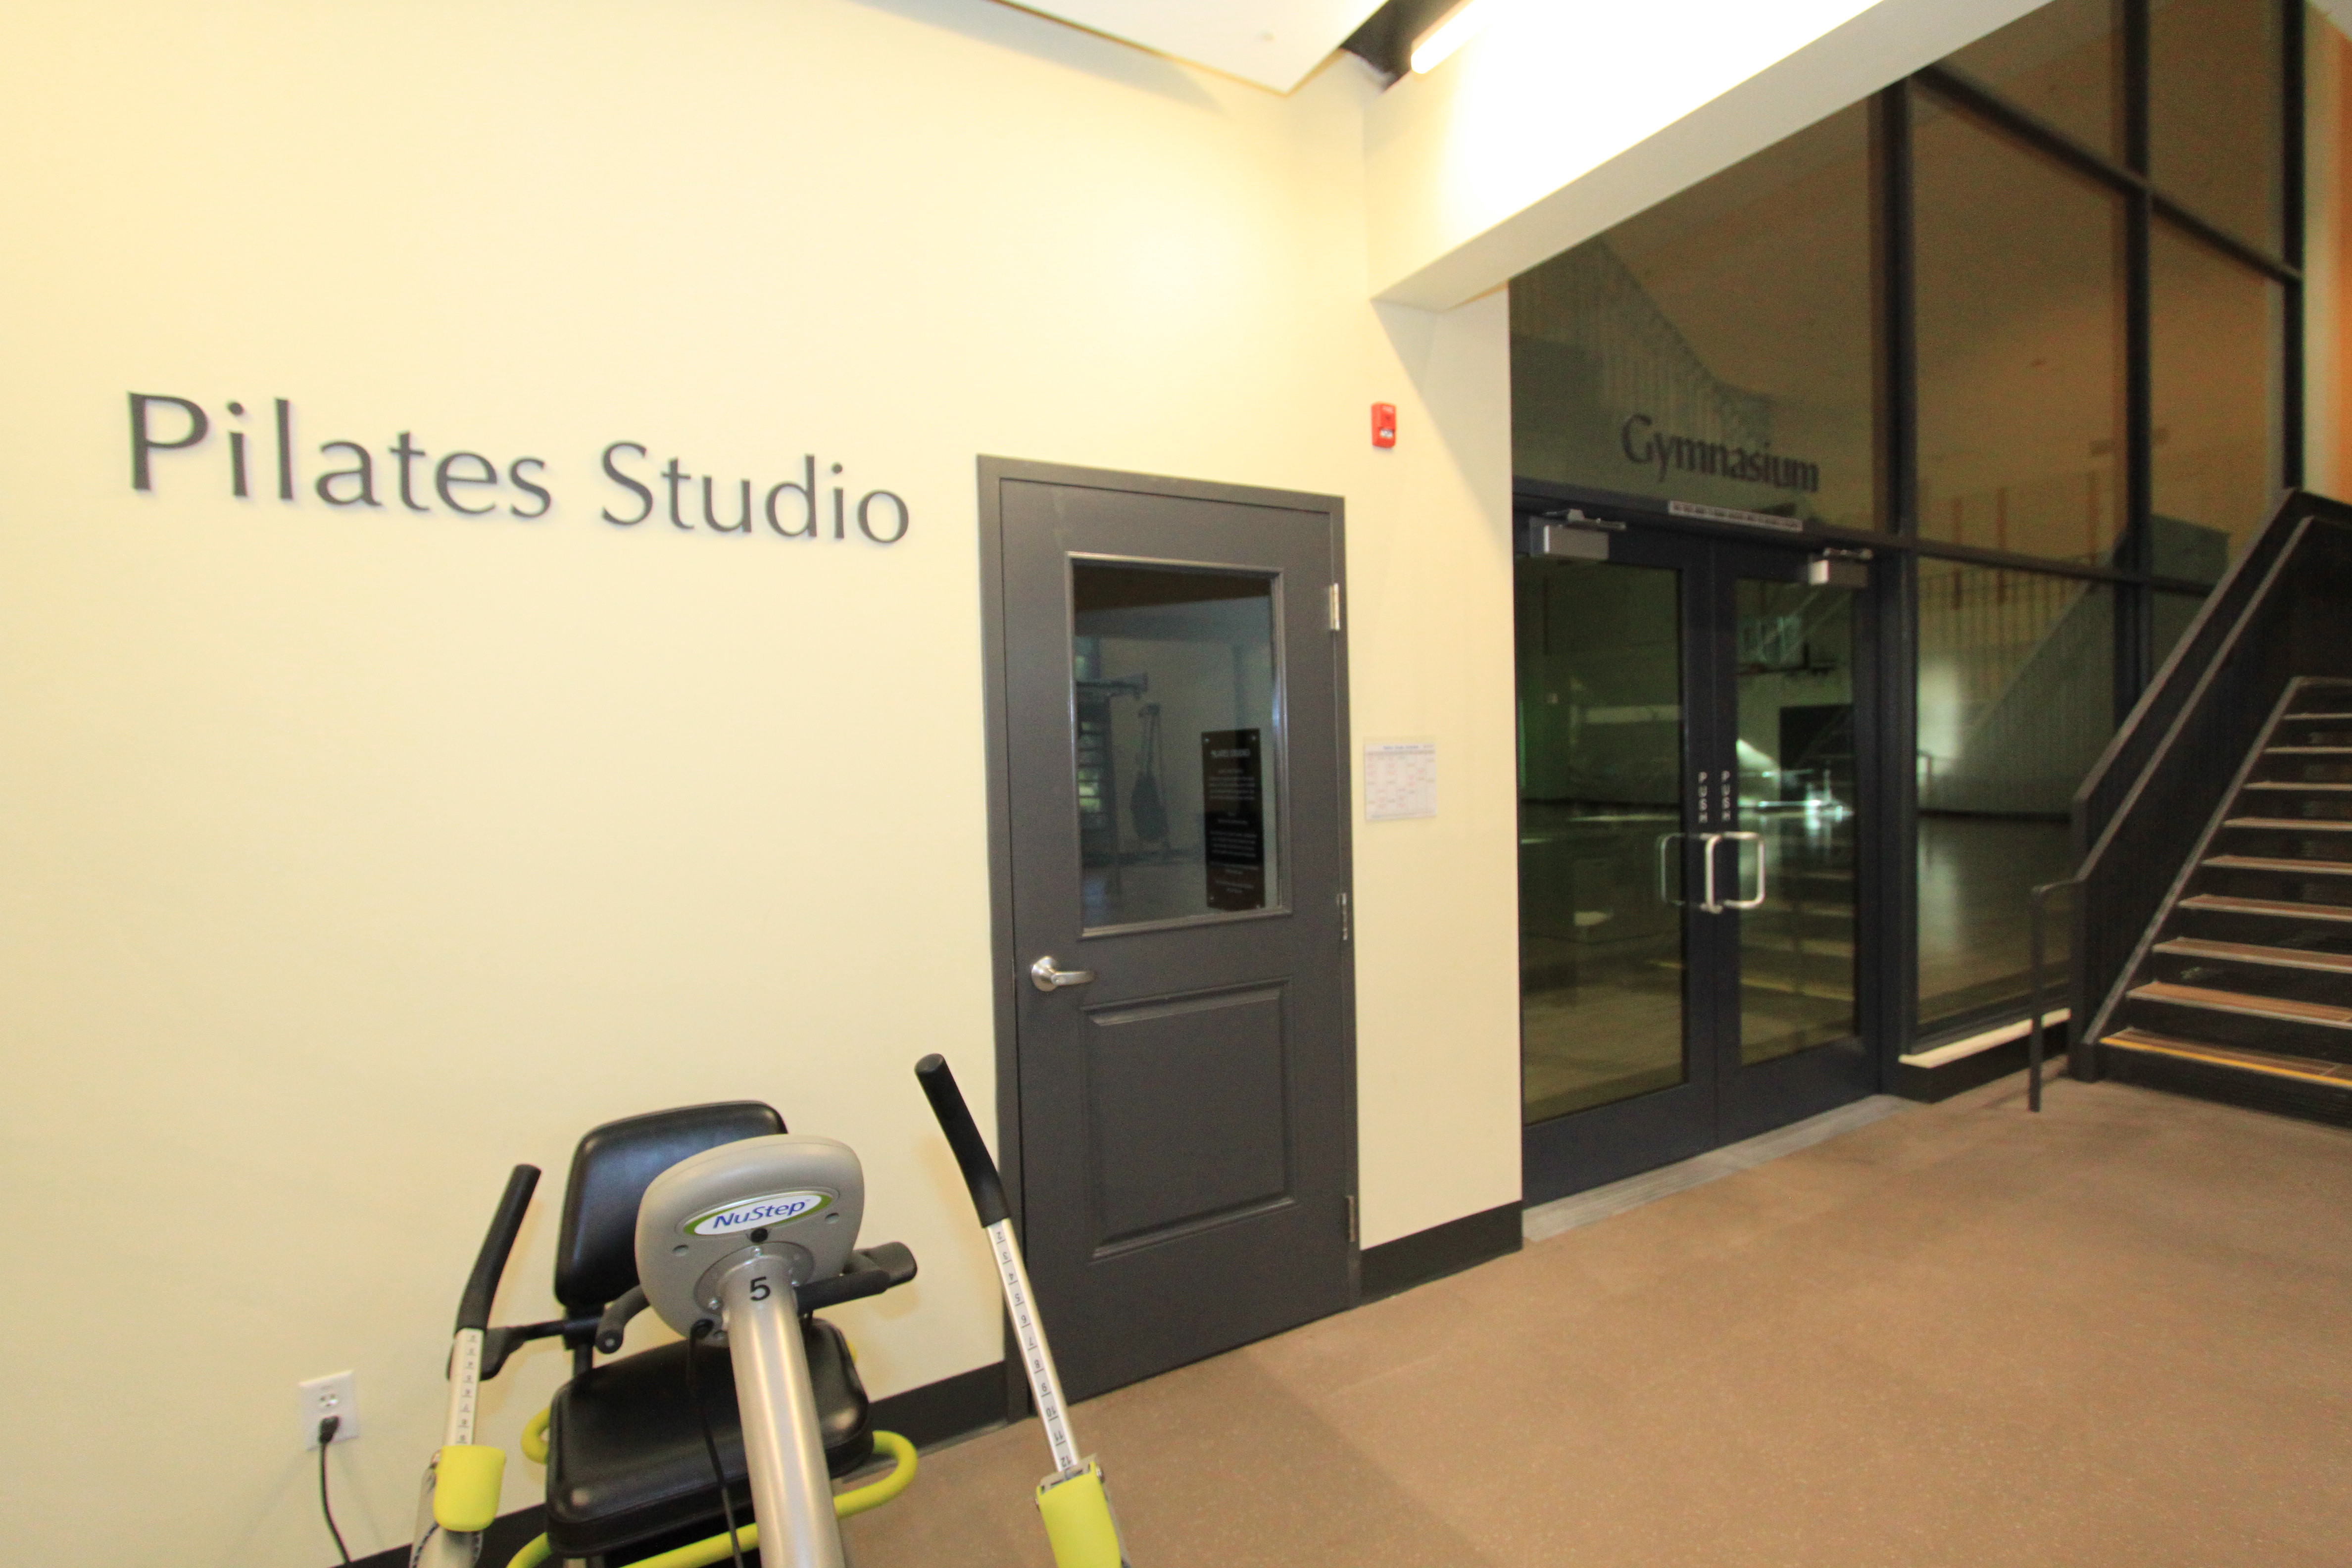 13 Fitness Pilates Studio